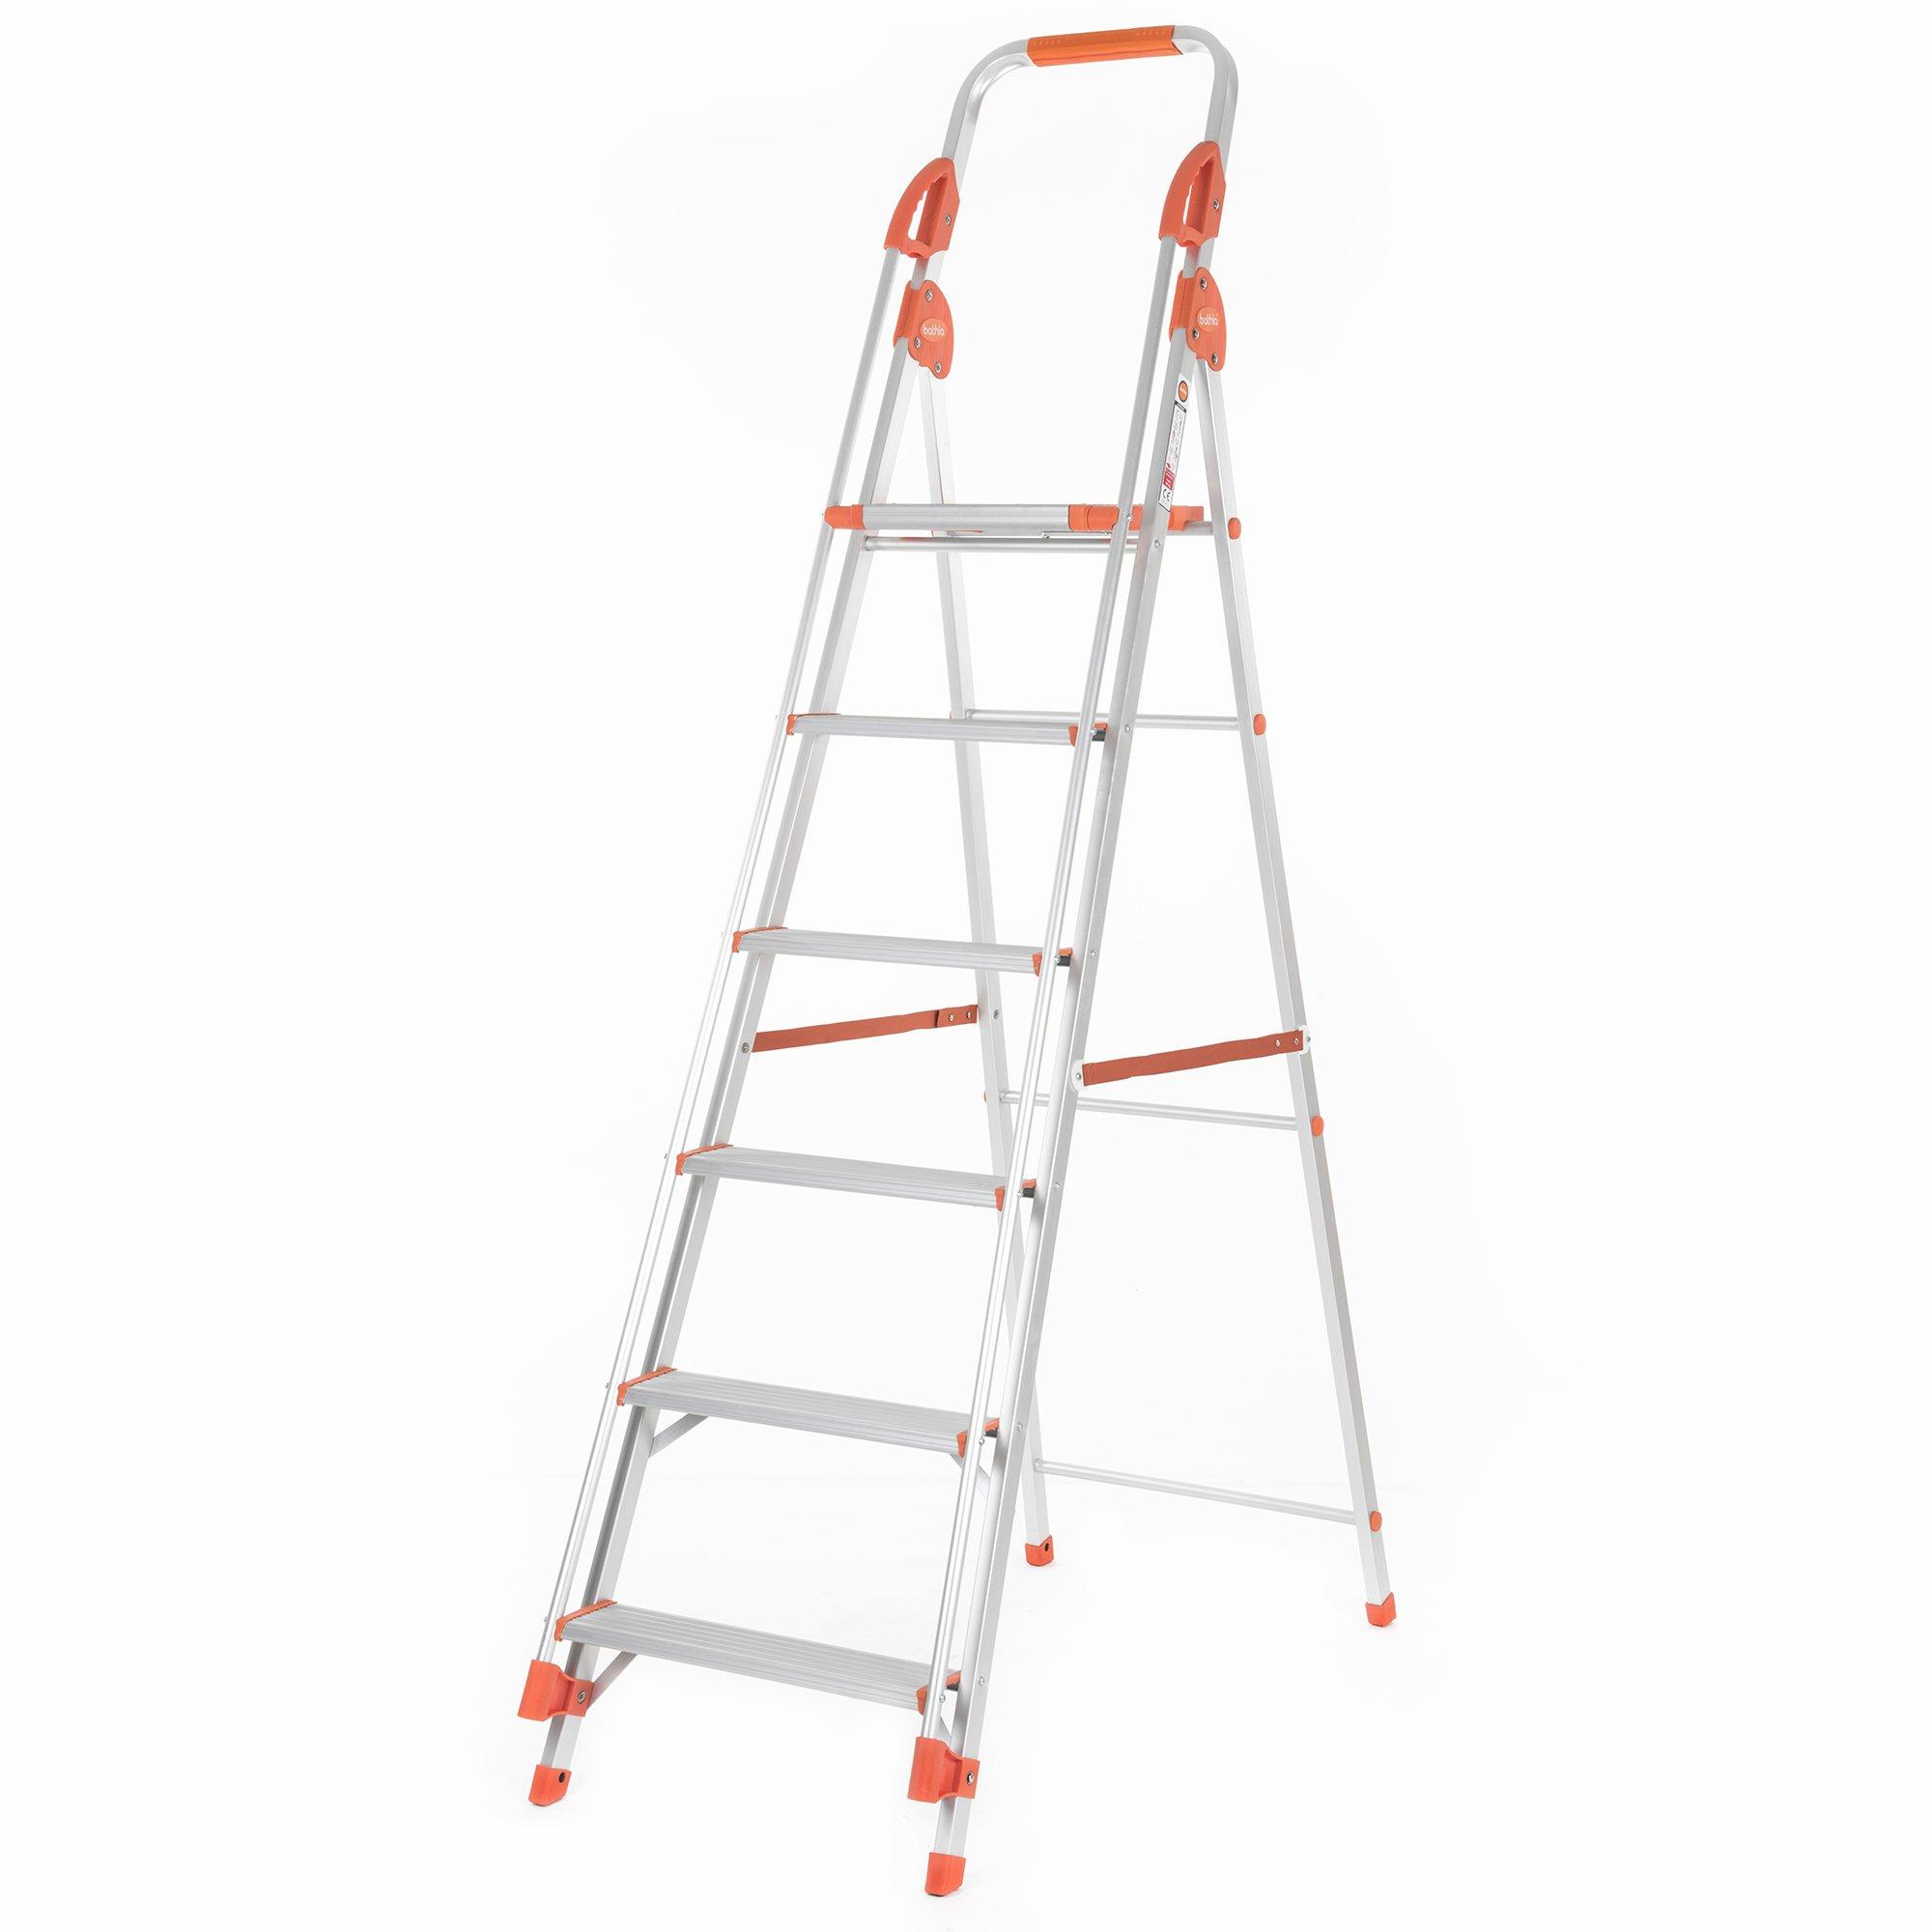 Bathla Zenith 6-Step Foldable Aluminium Ladder with Hand Rails & Safety  Grips